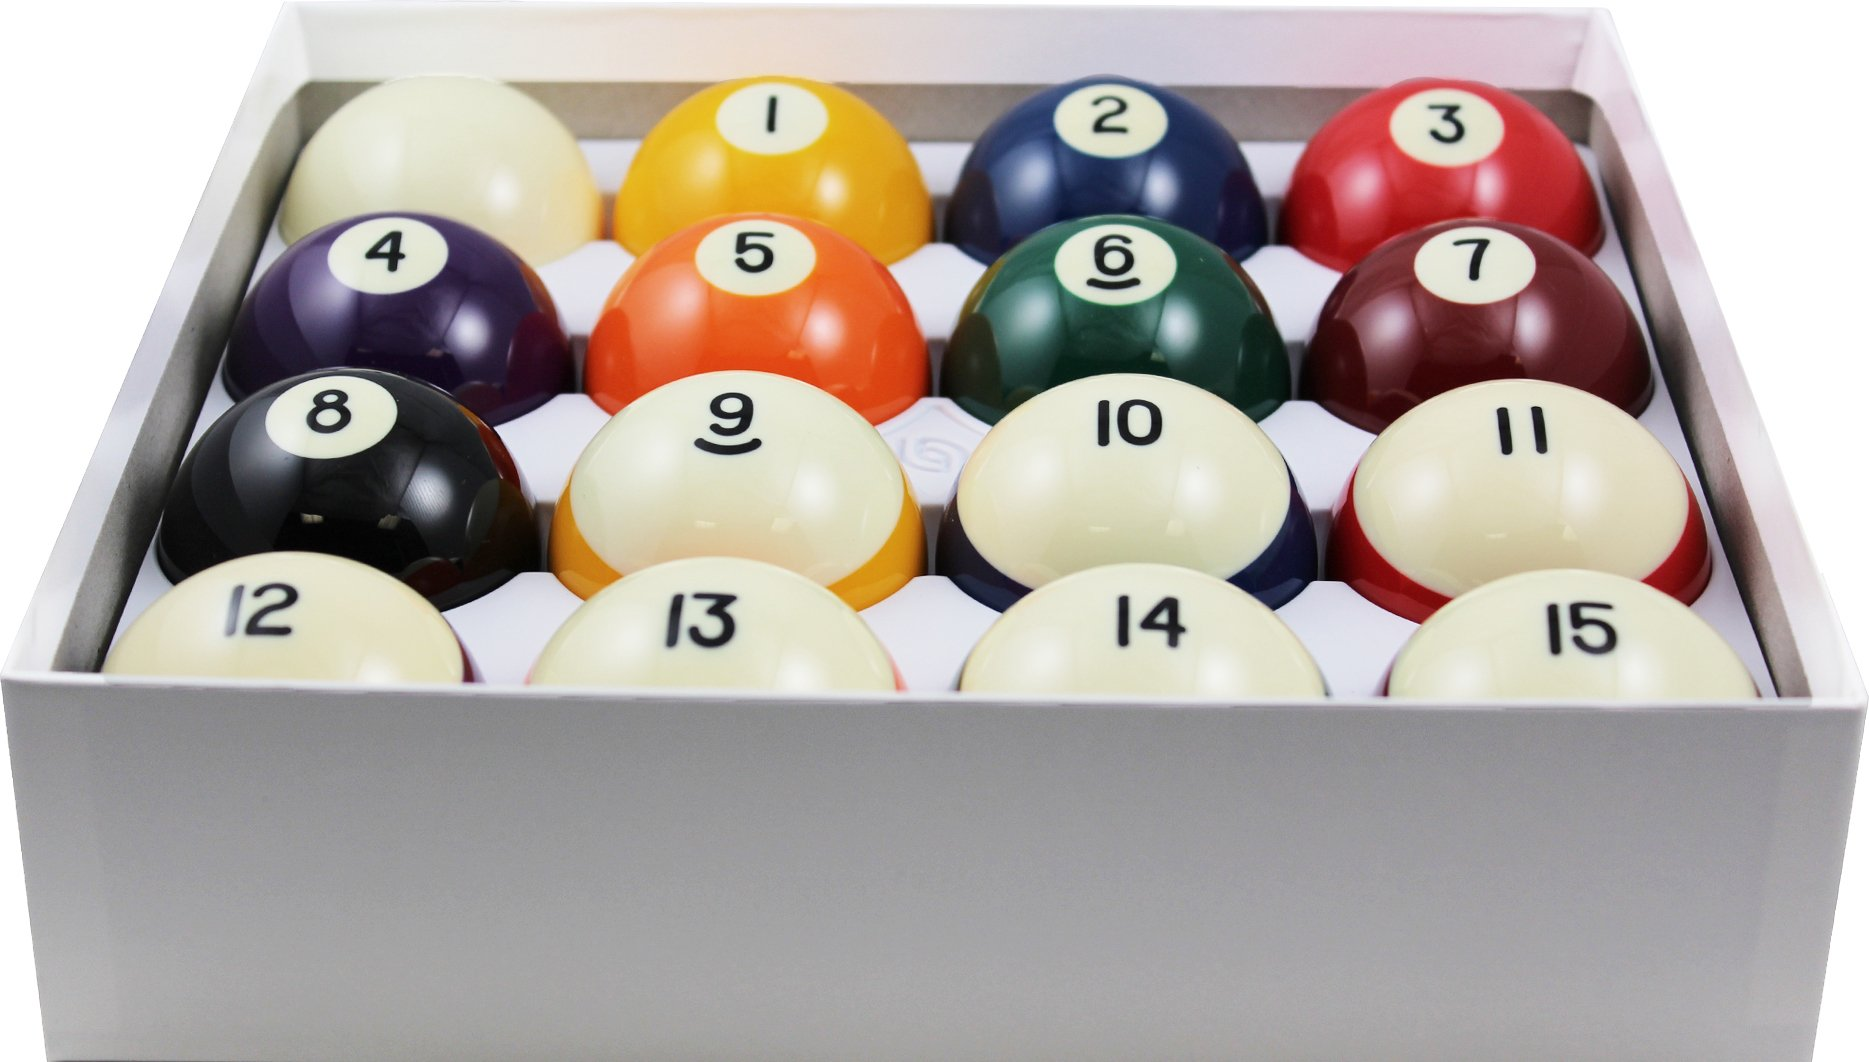 "Aramith 2-1/4"" Regulation Size Crown Standard Billiard/Pool Balls, Complete 16 Ball Set"